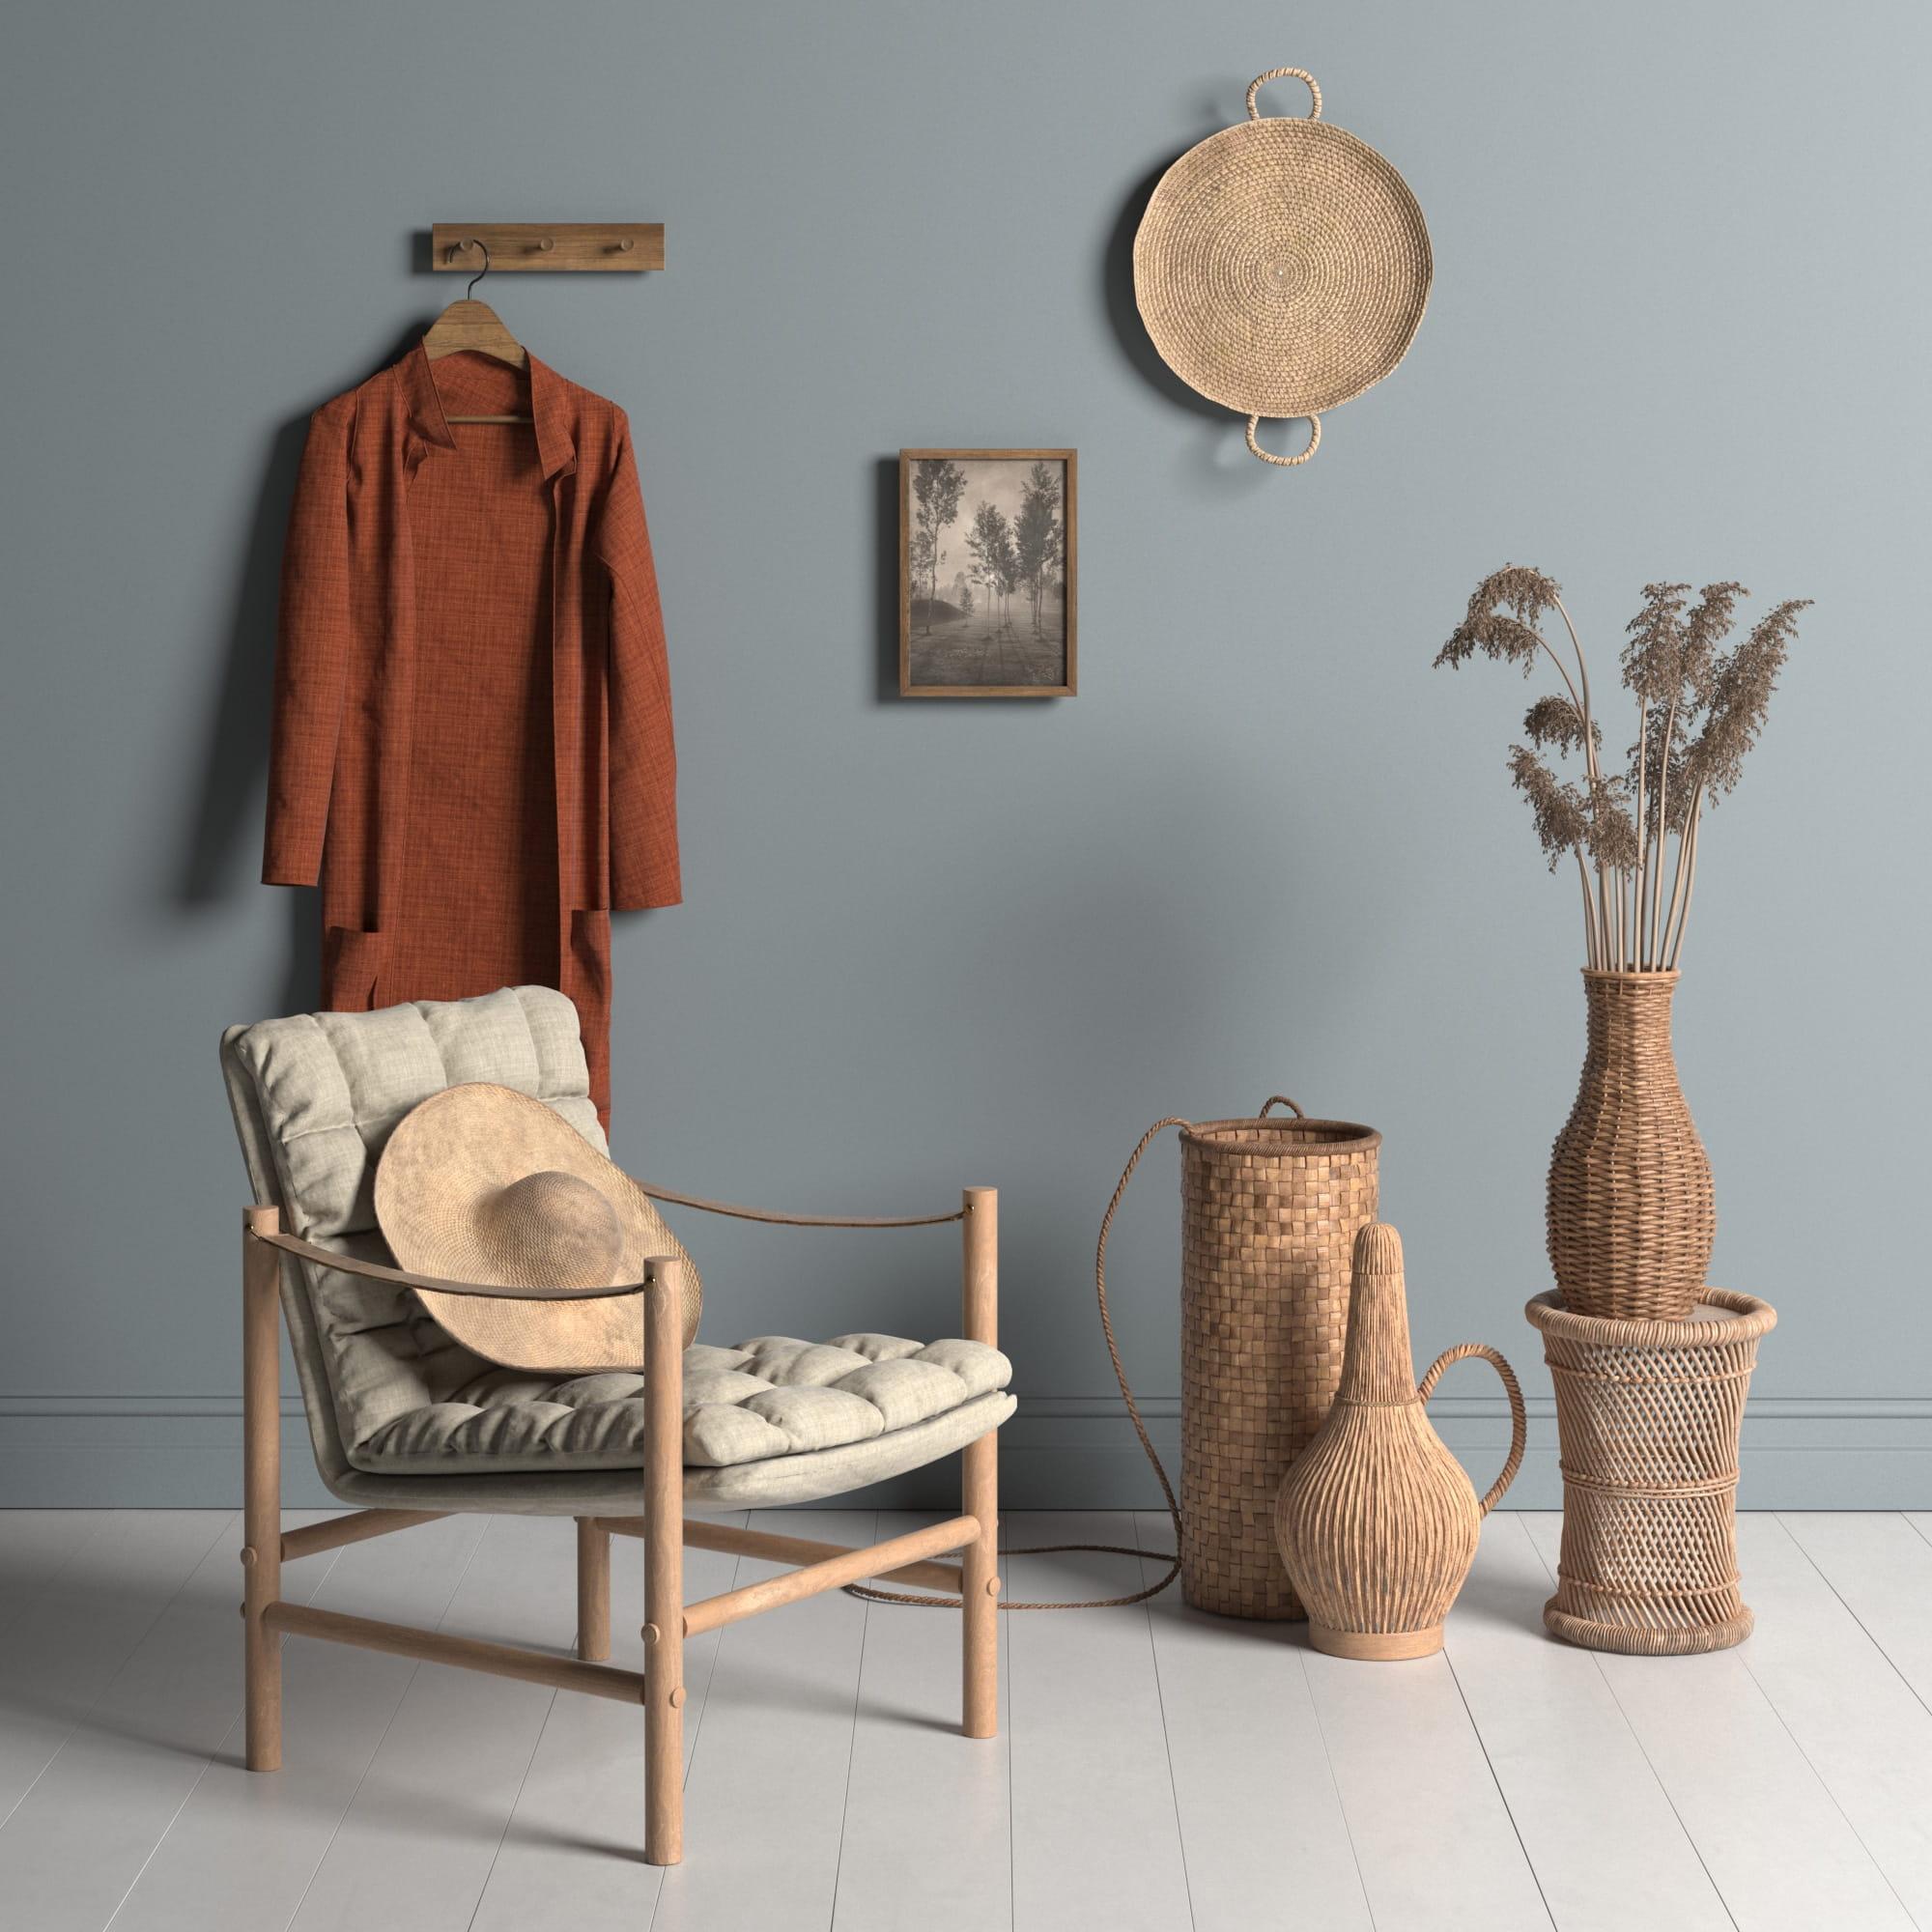 furniture set 9 AM225